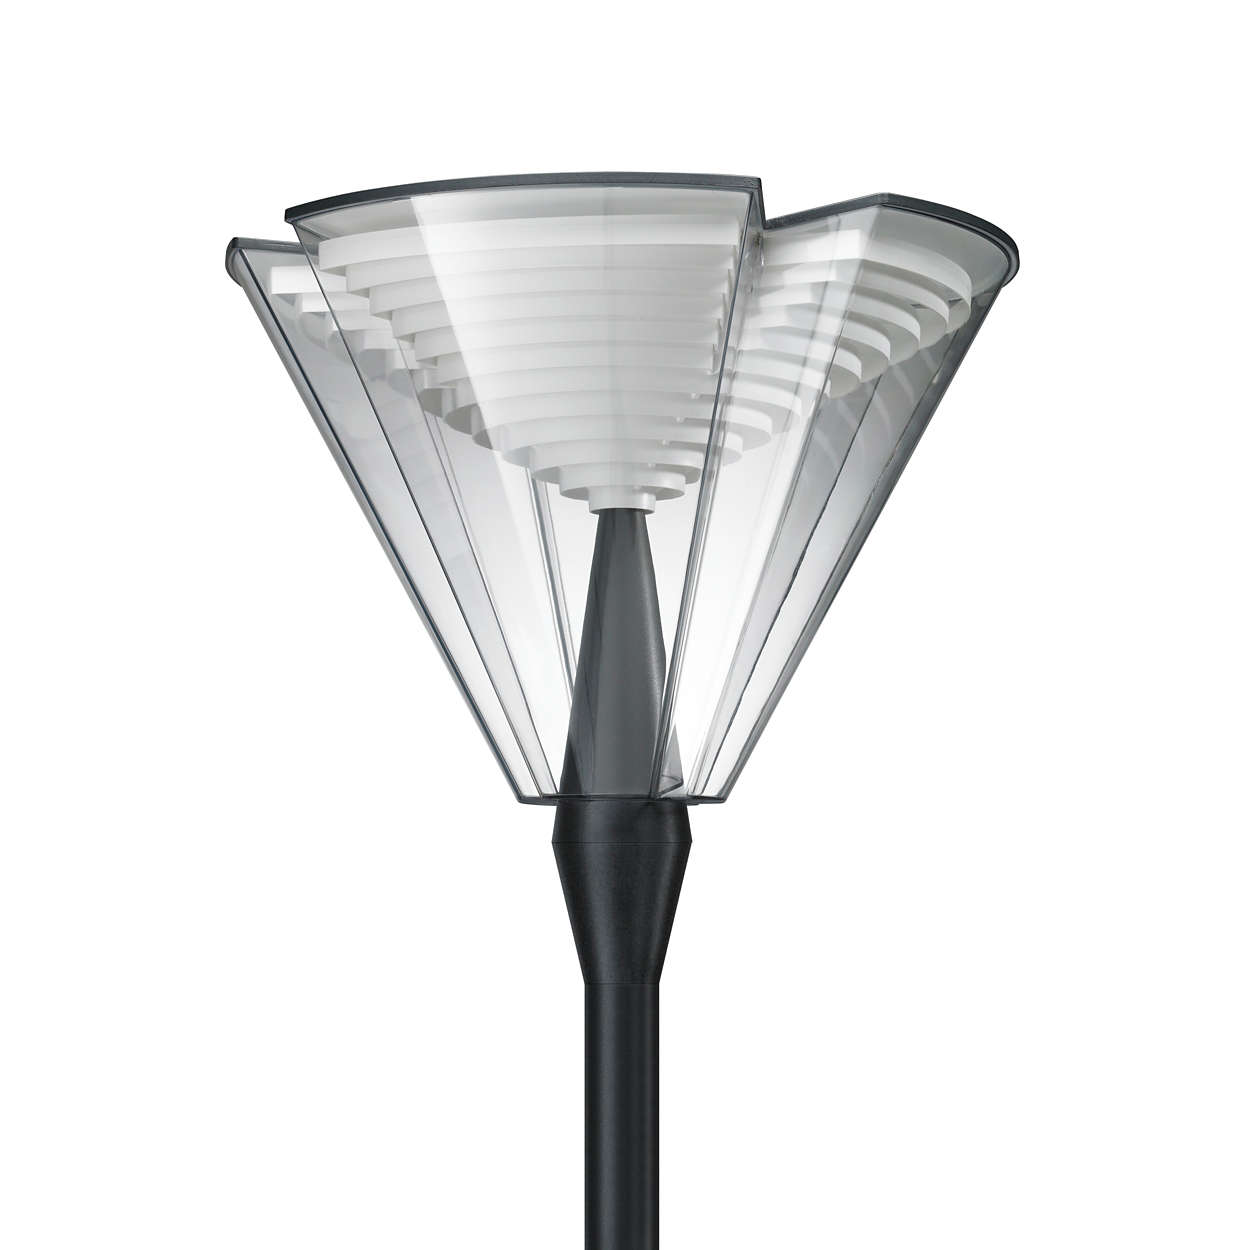 ParkView LED – et fleksibelt parkarmatur